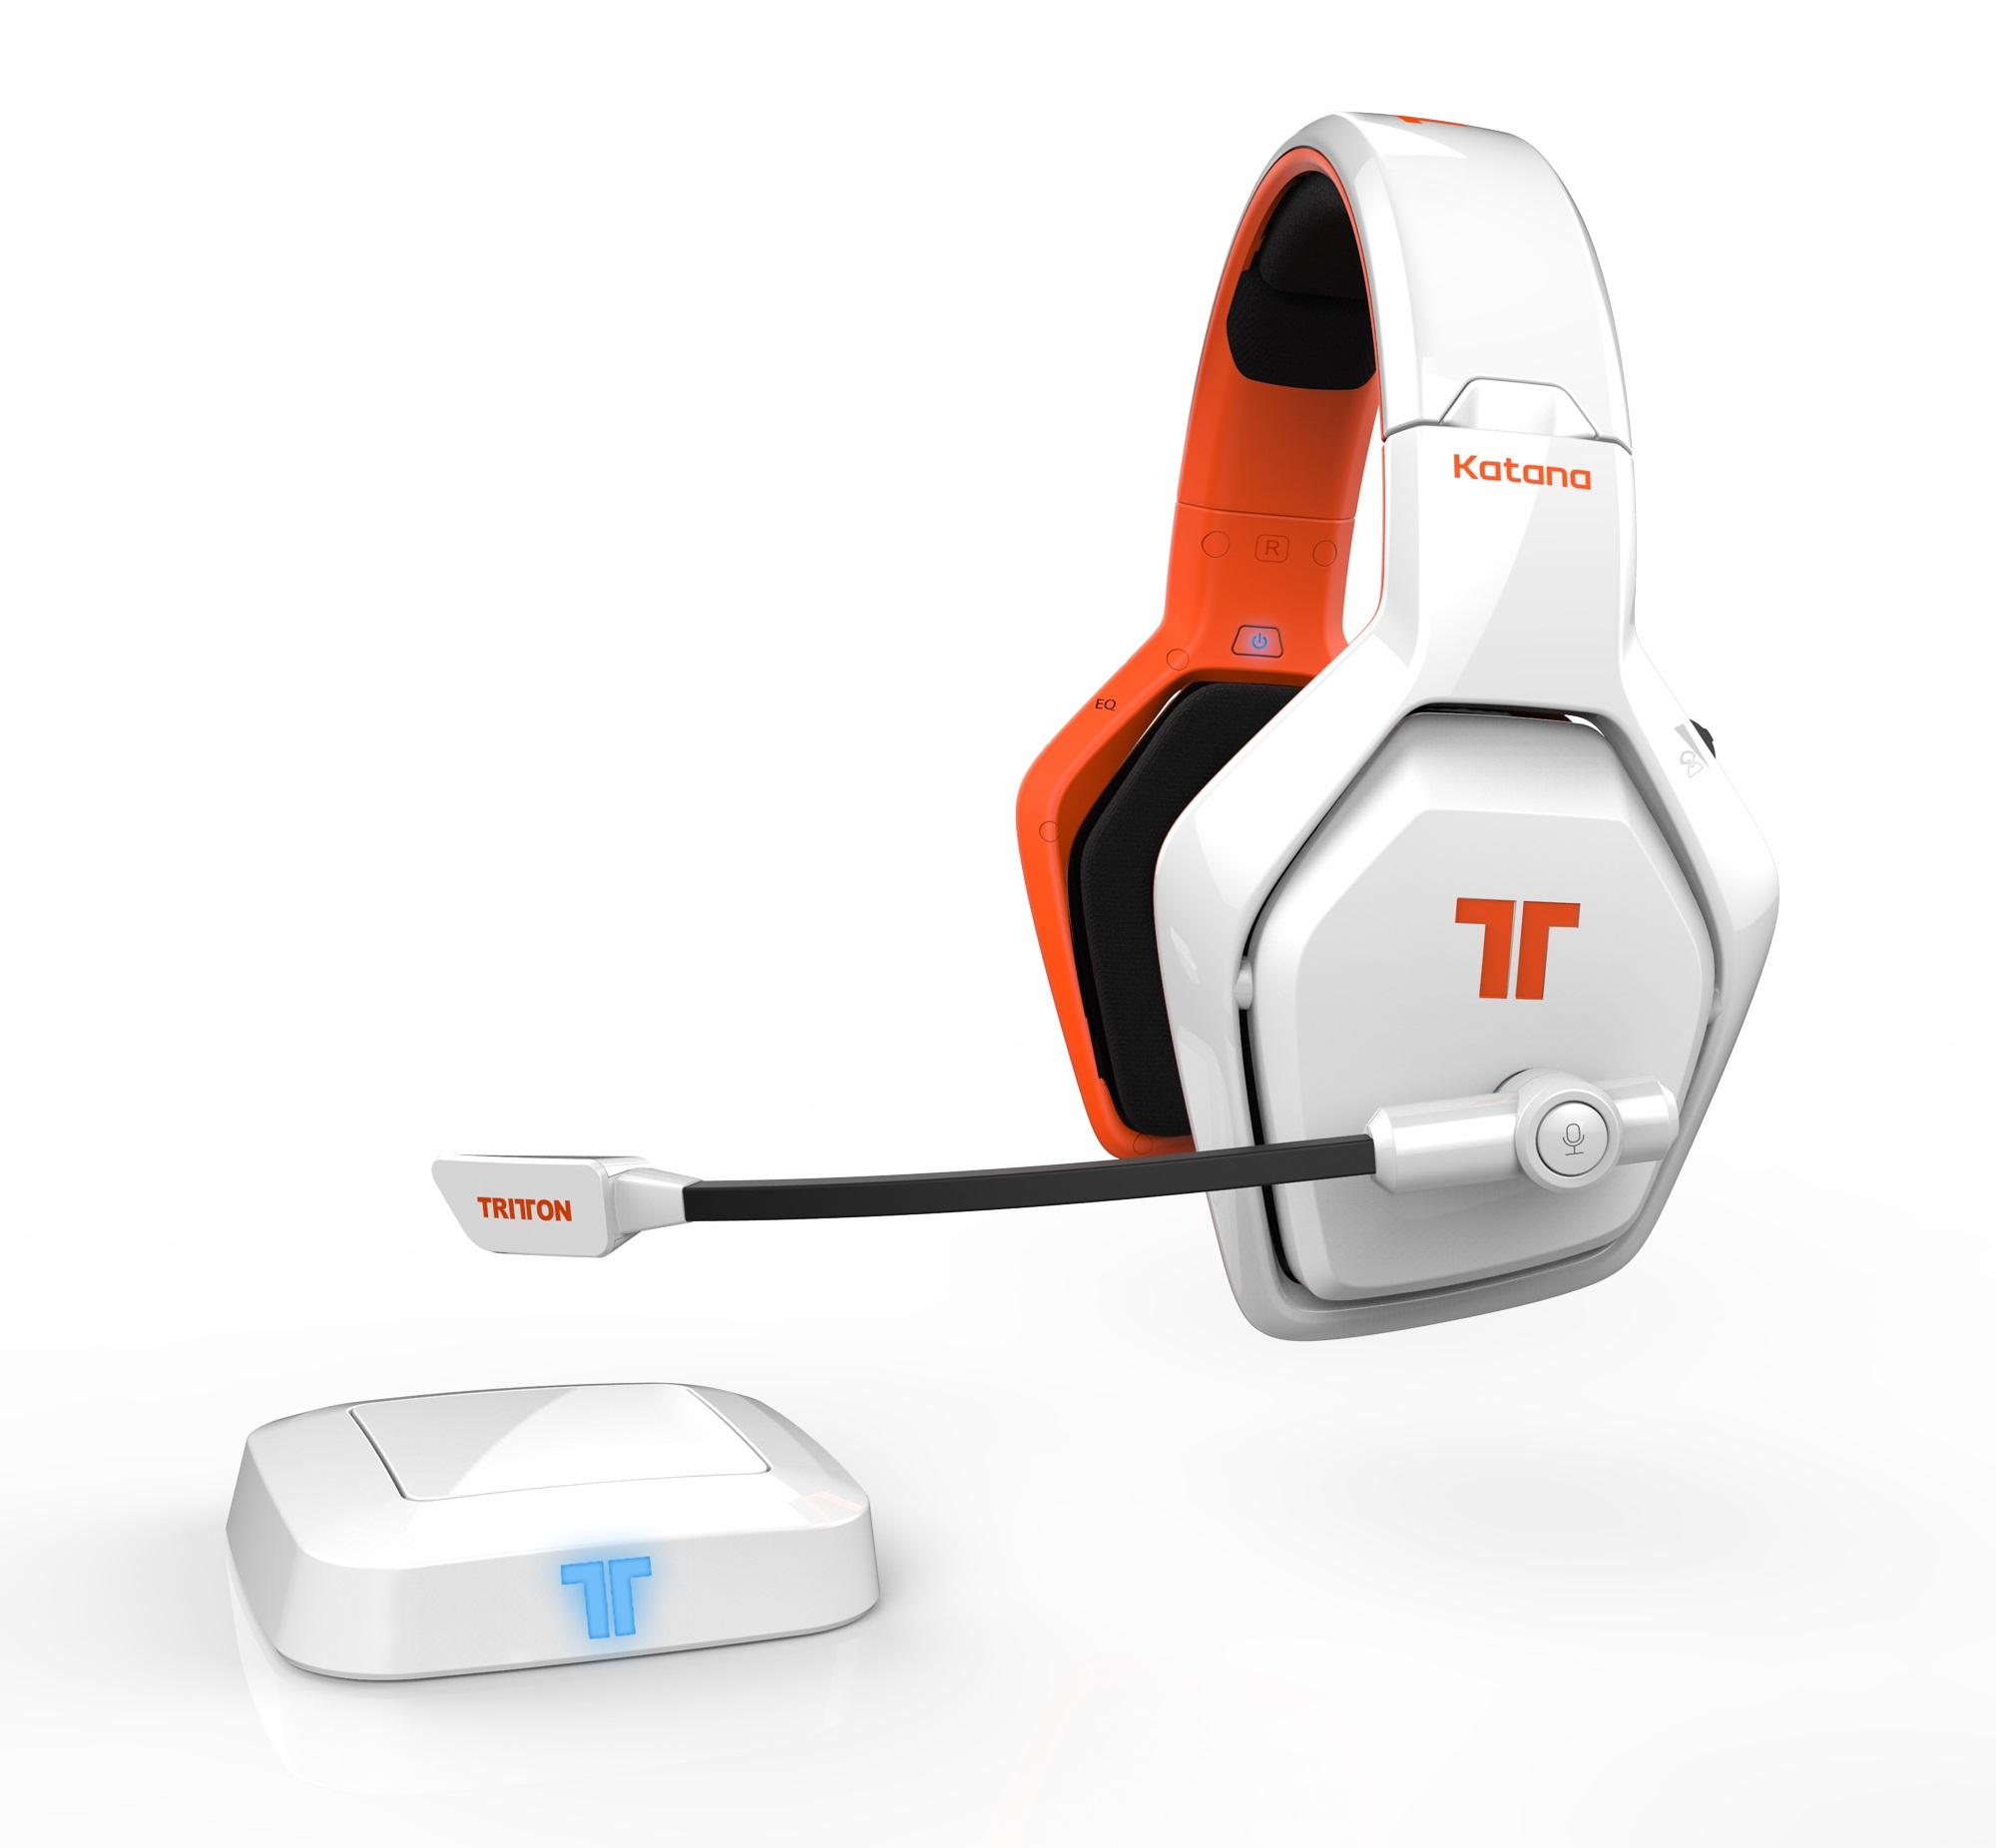 Mad Catz Tritton Katana headset